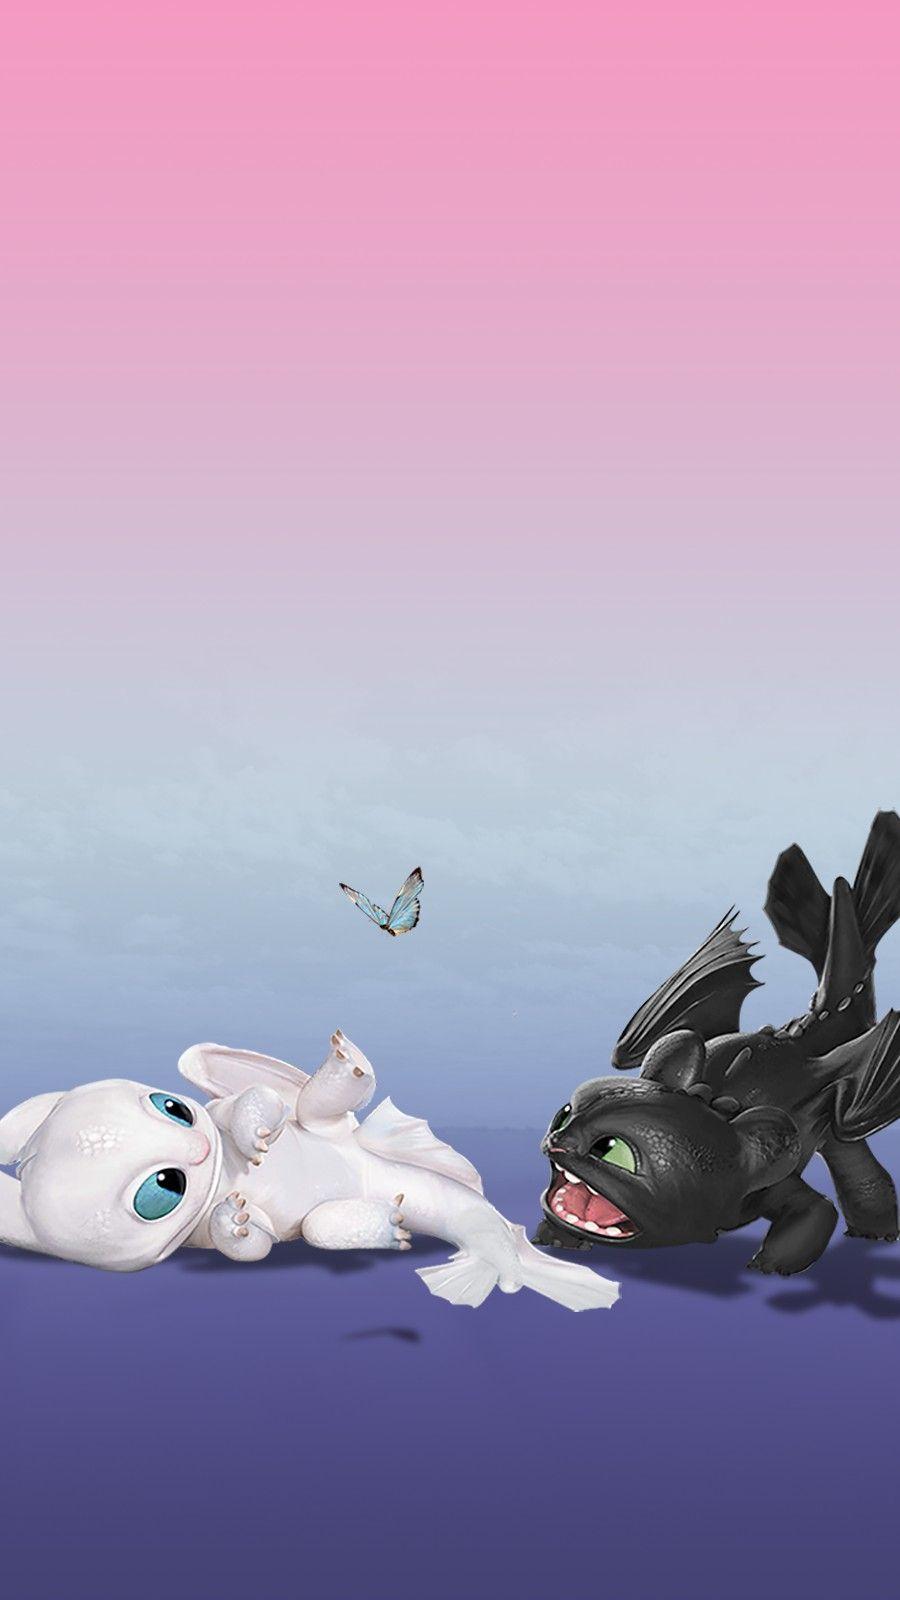 Pin De Siu Poh Ang Em How Train Your Dragon Walpapers Desenhos